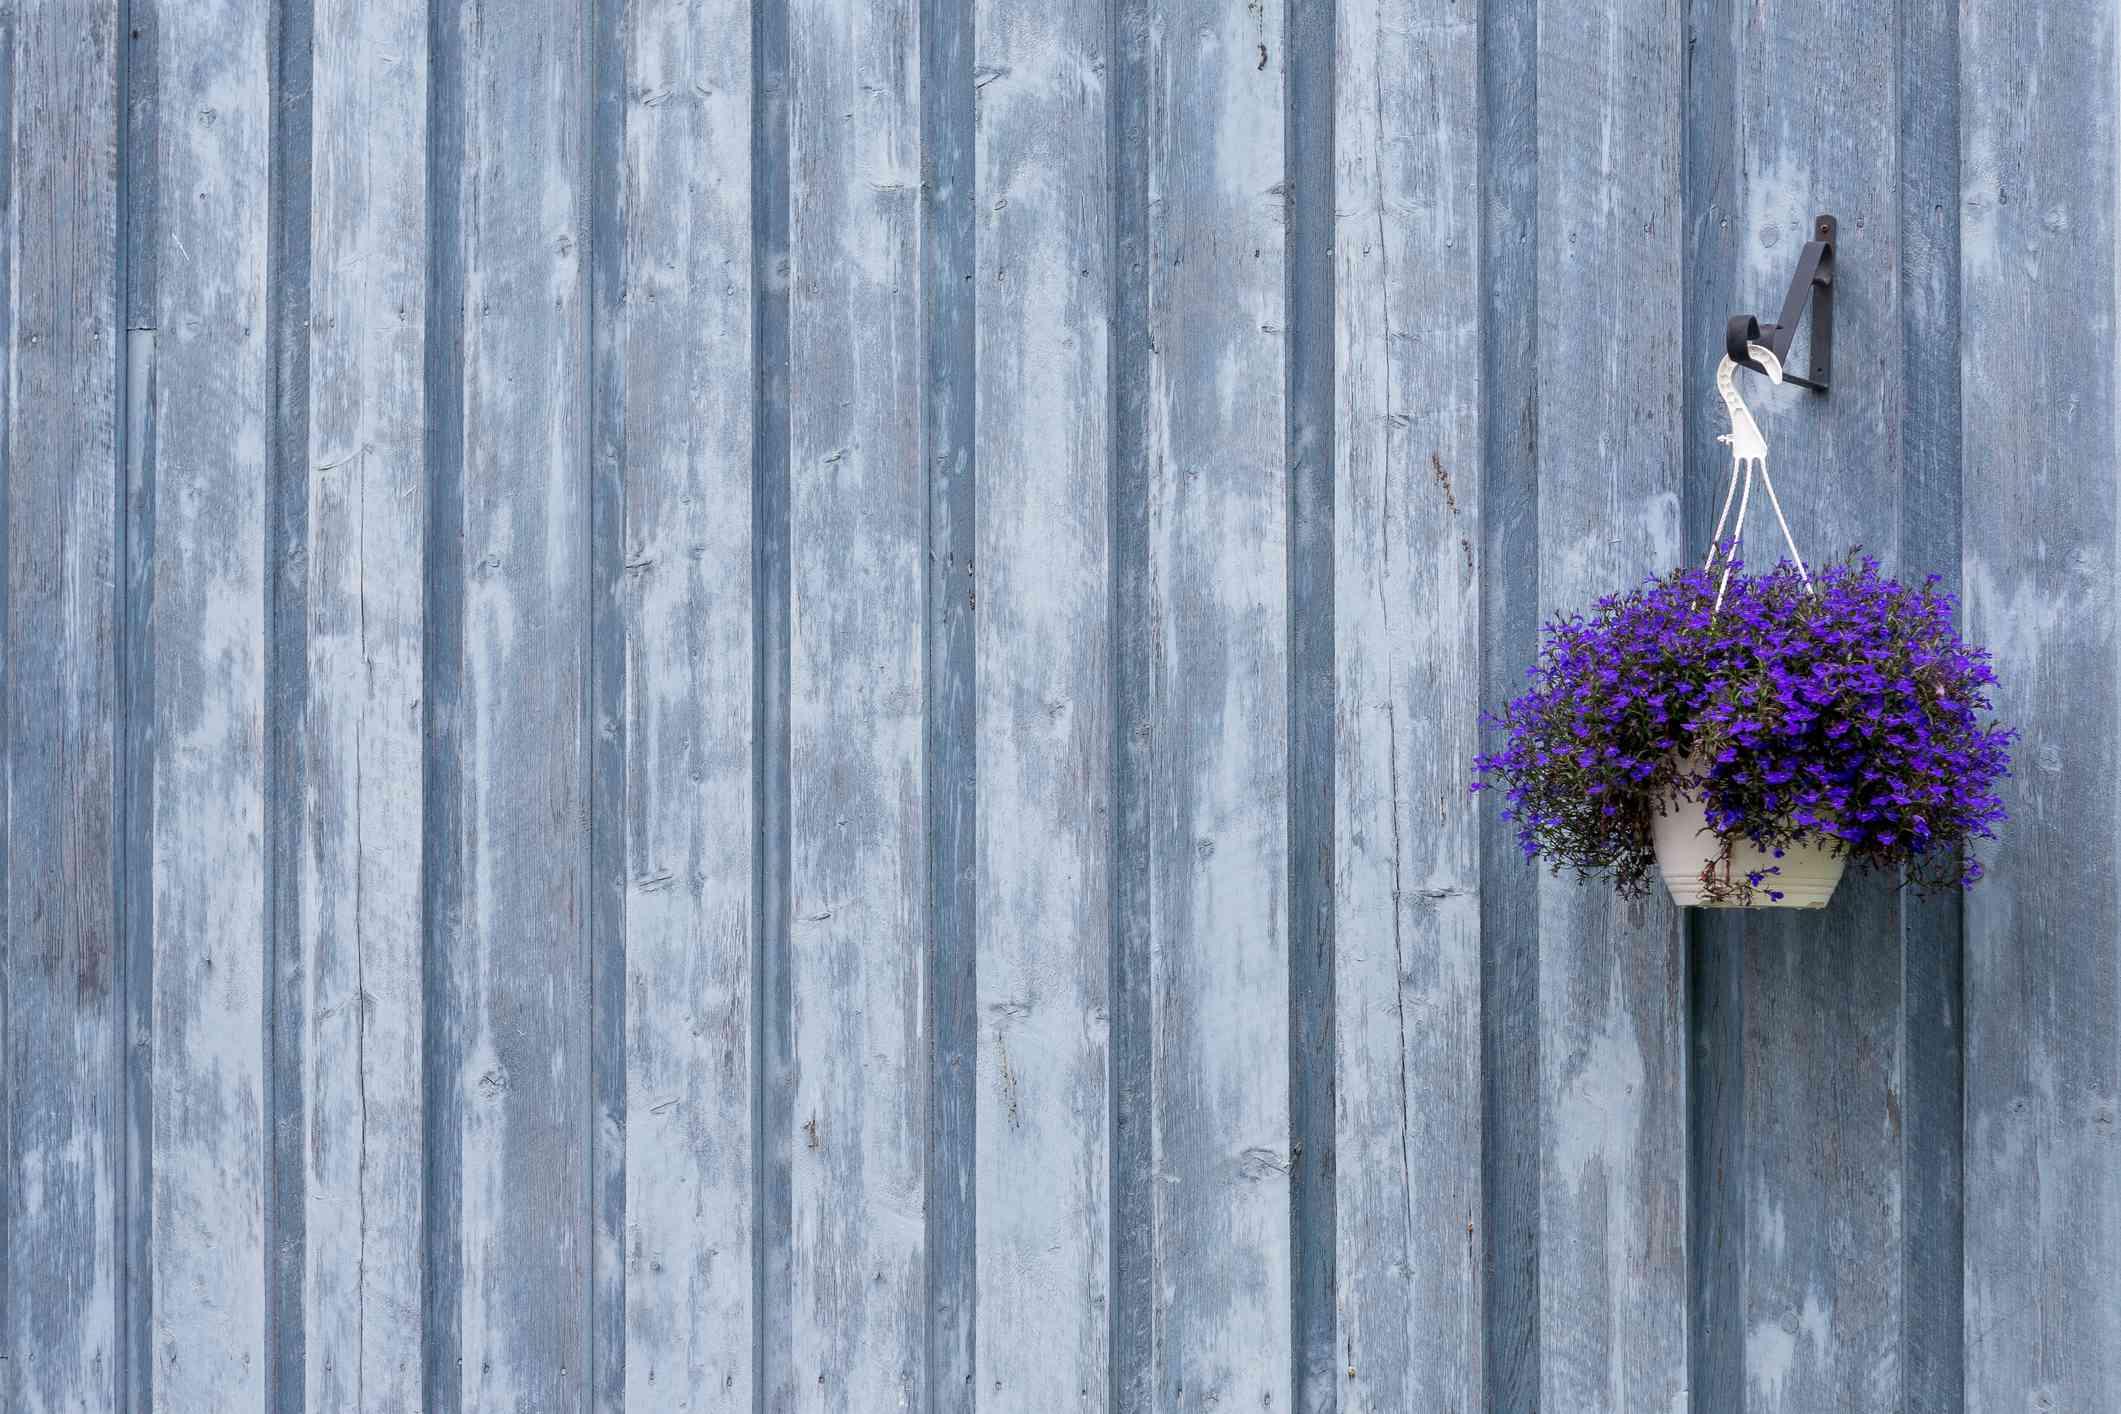 Hanging basket of Lobelia flowers